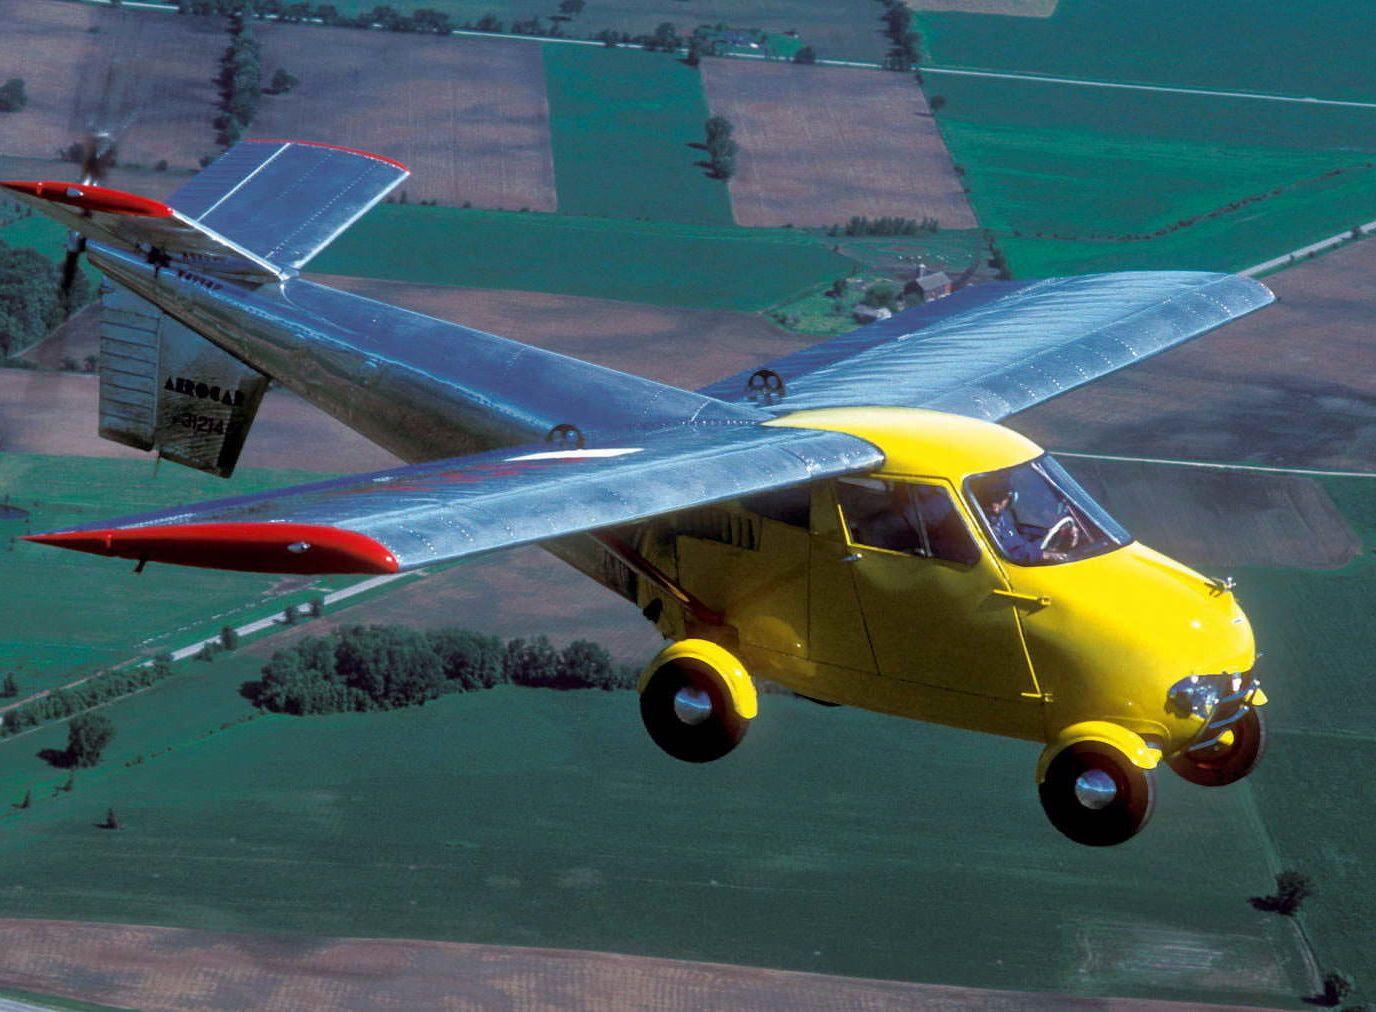 For Sale An Original Aerocar One A 100 Functional